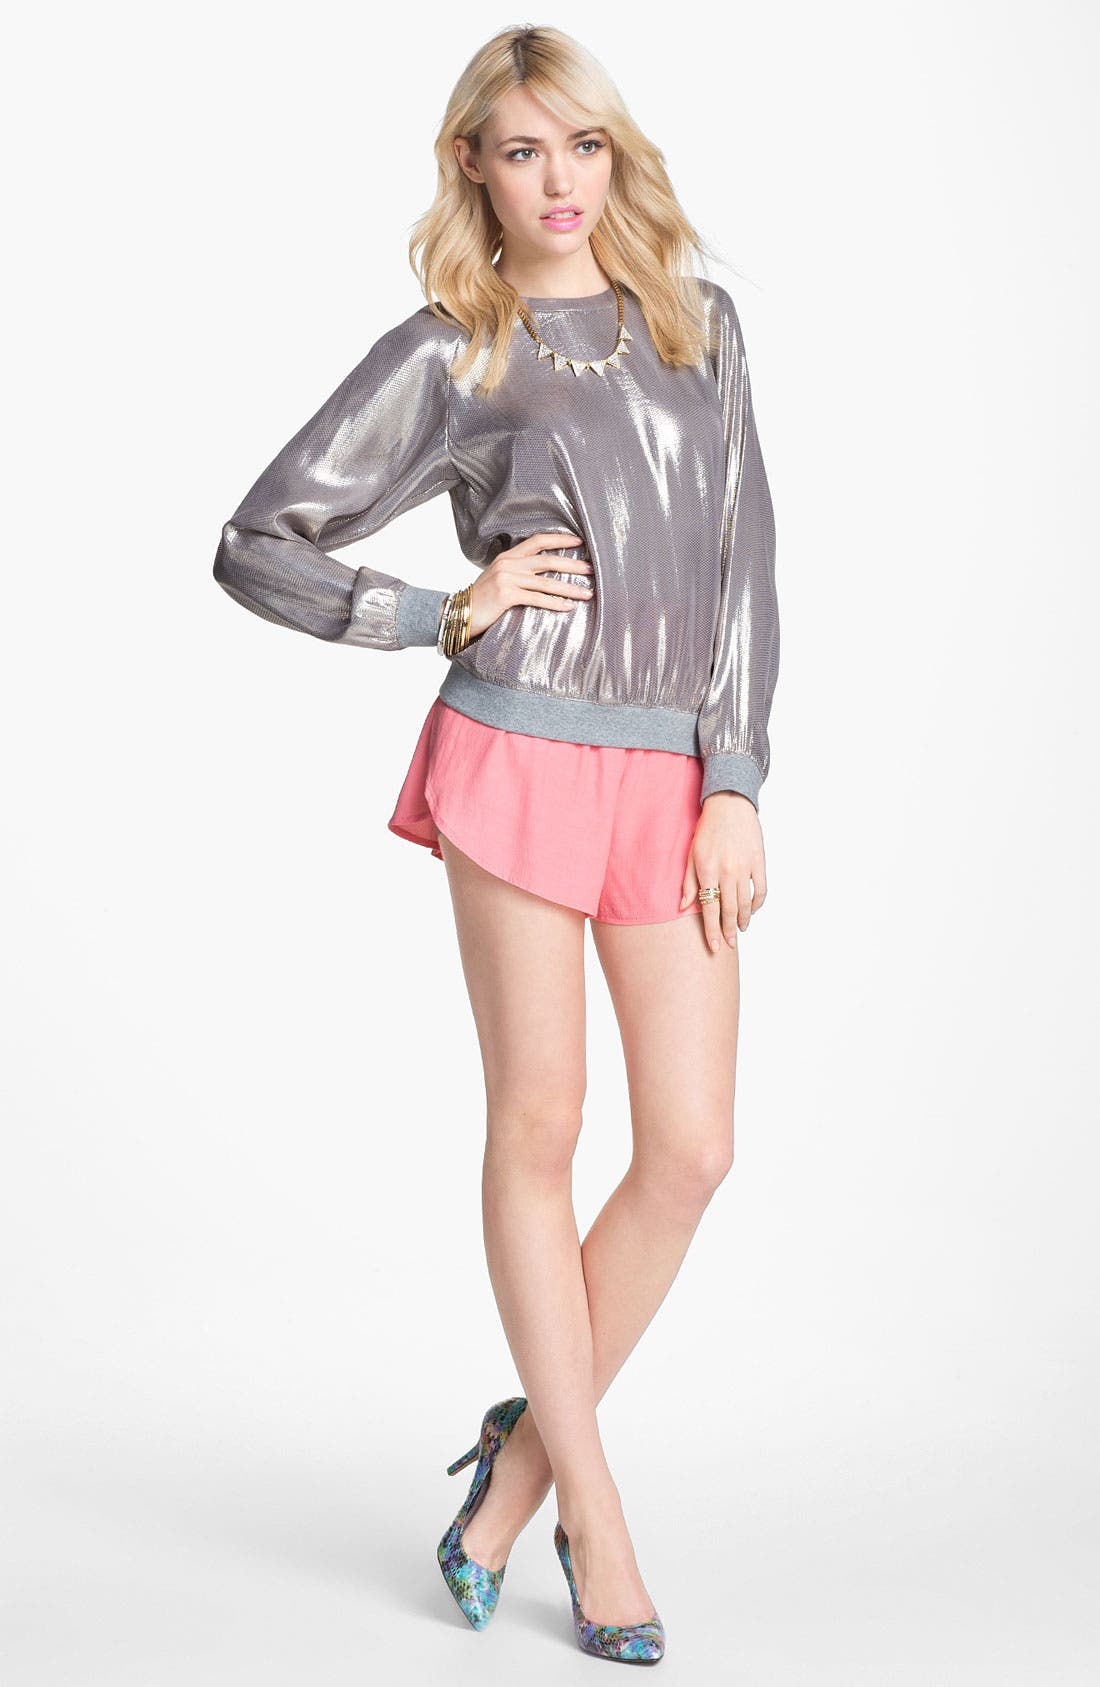 Main Image - Mural Sweatshirt, BB Dakota Lace Trim Shorts & Vince Camuto Pump